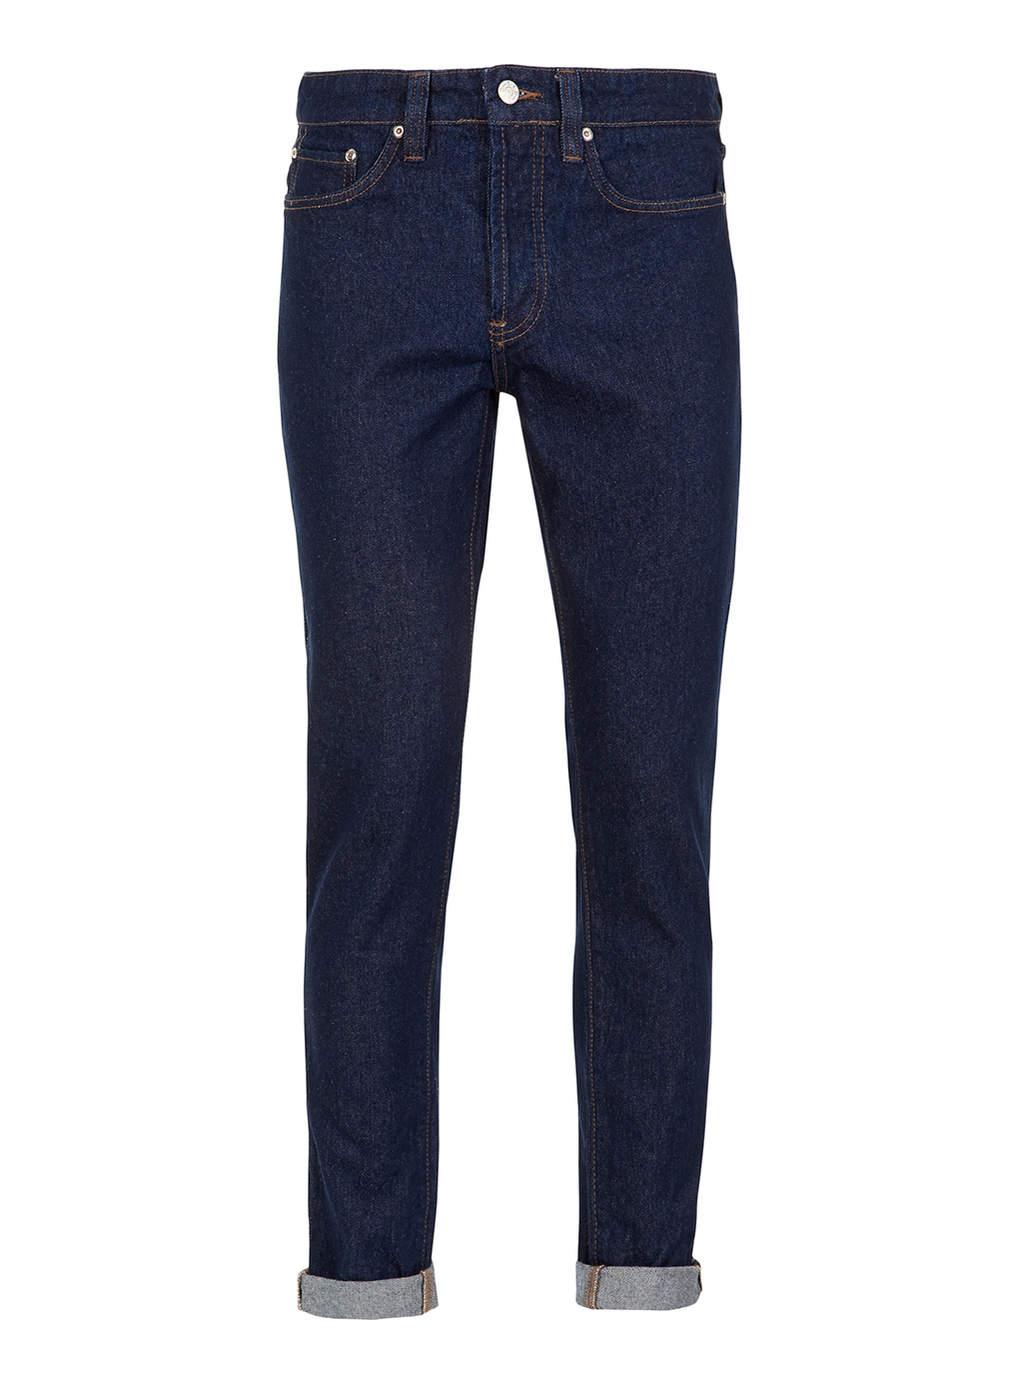 Light Wash Retro Skinny Jeans, $76